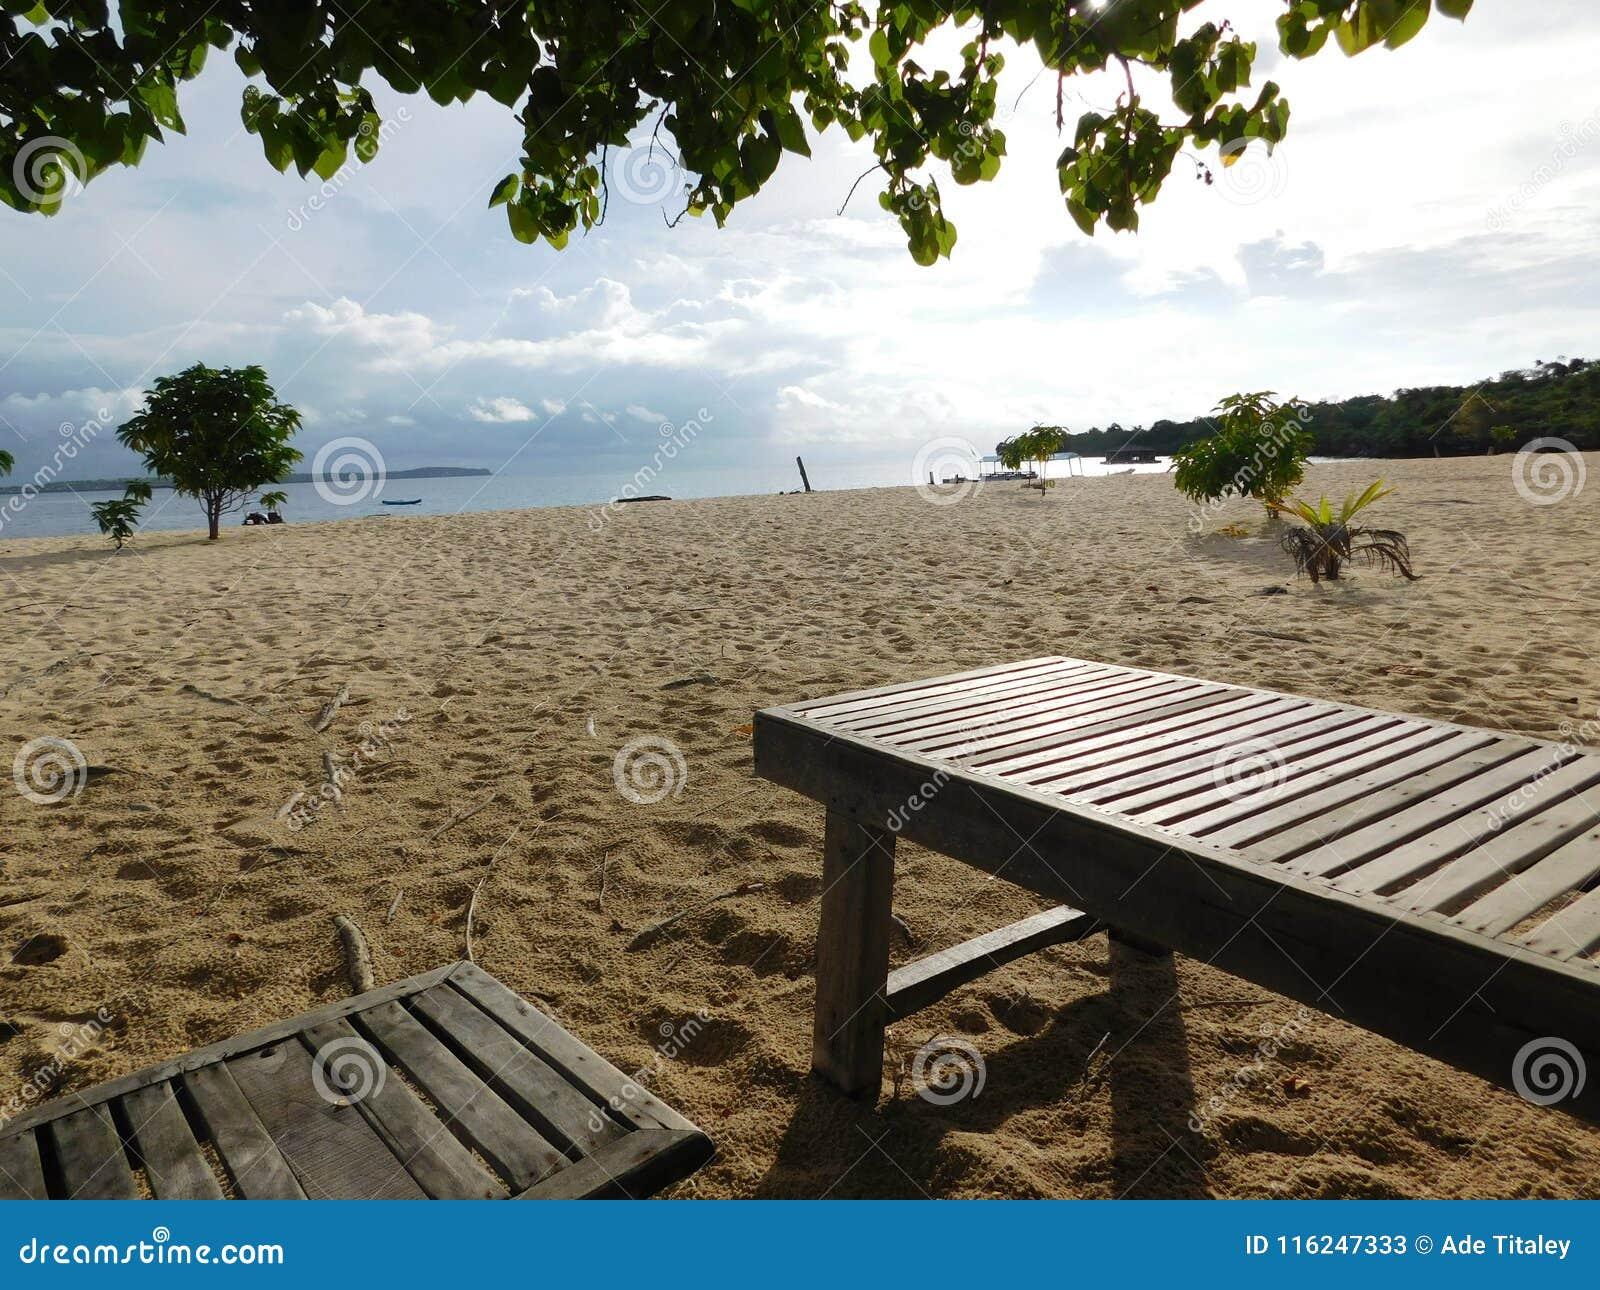 Abstrakt begrepp strand, natur, textur, sand